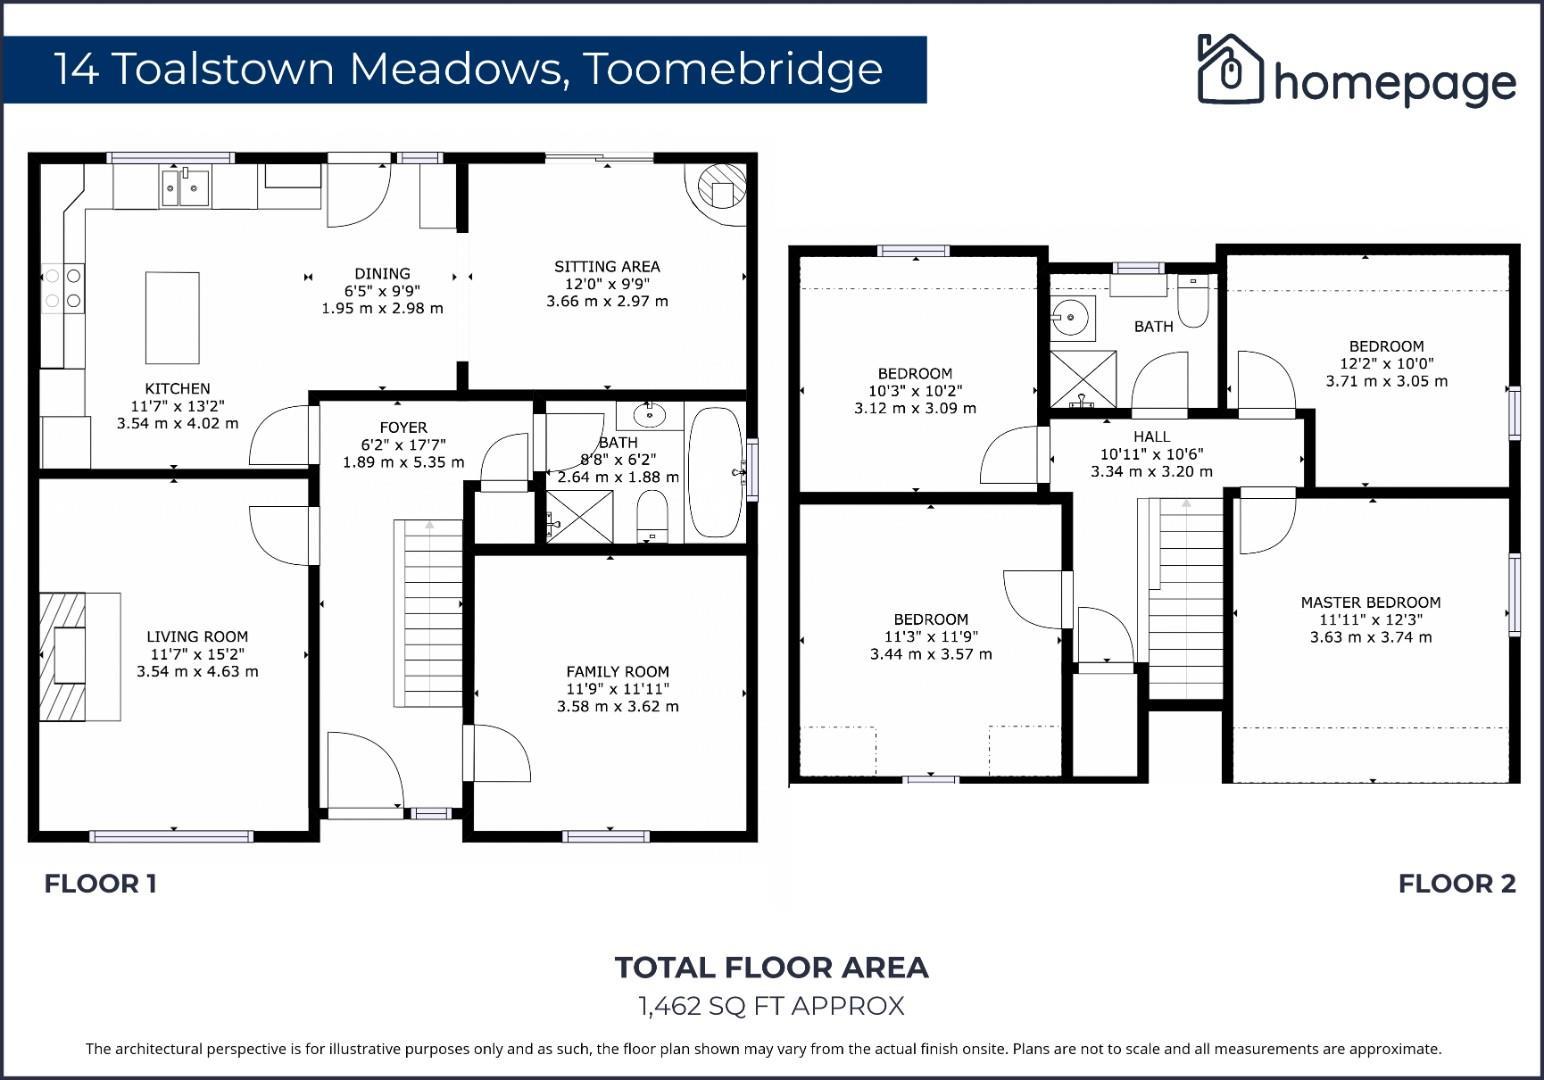 14 Toalstown Meadows Floor Plan.jpg